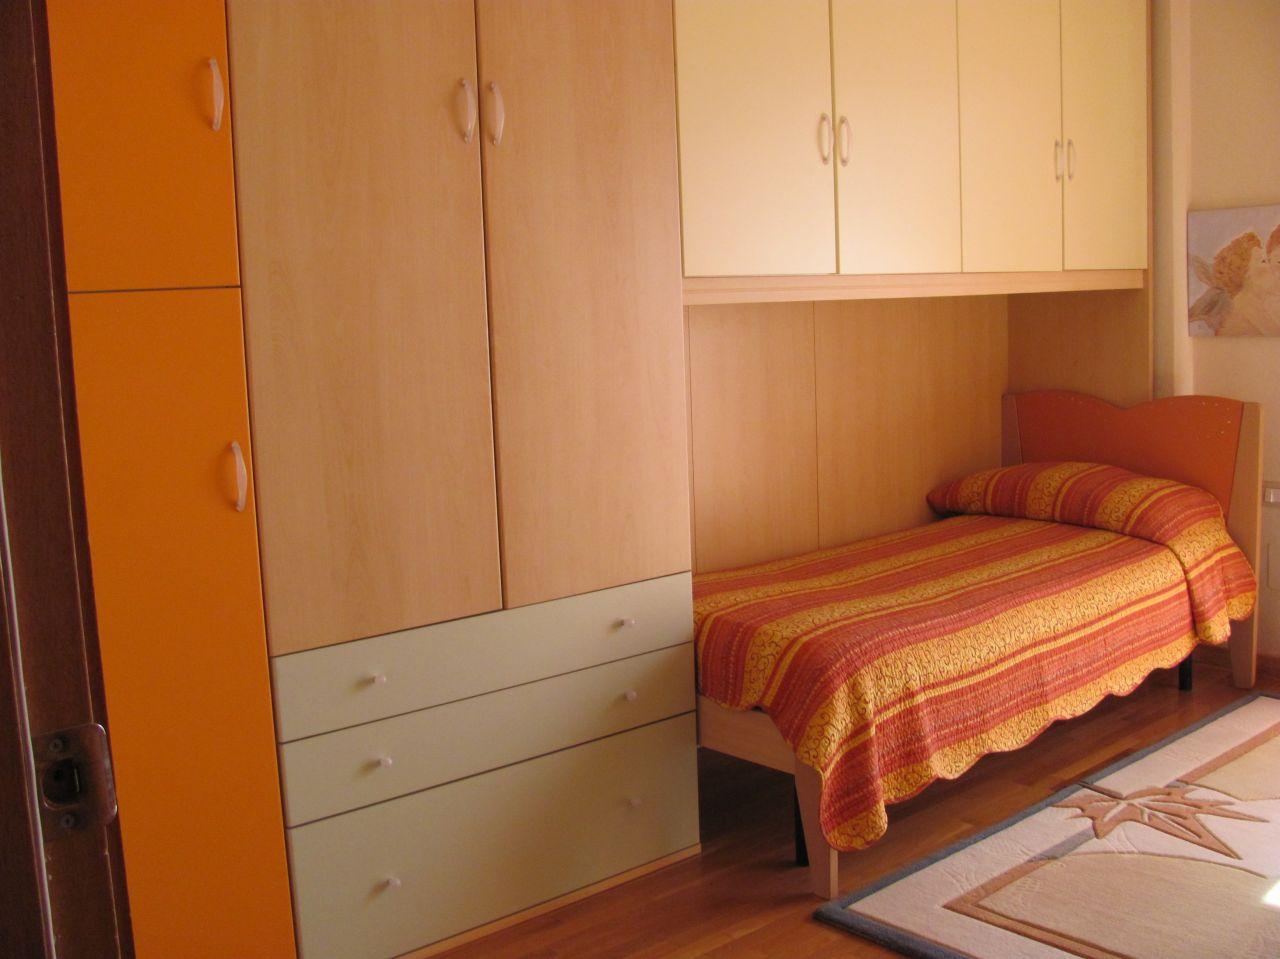 Three bedroom apartment for rent in a prestigious location in Tirana